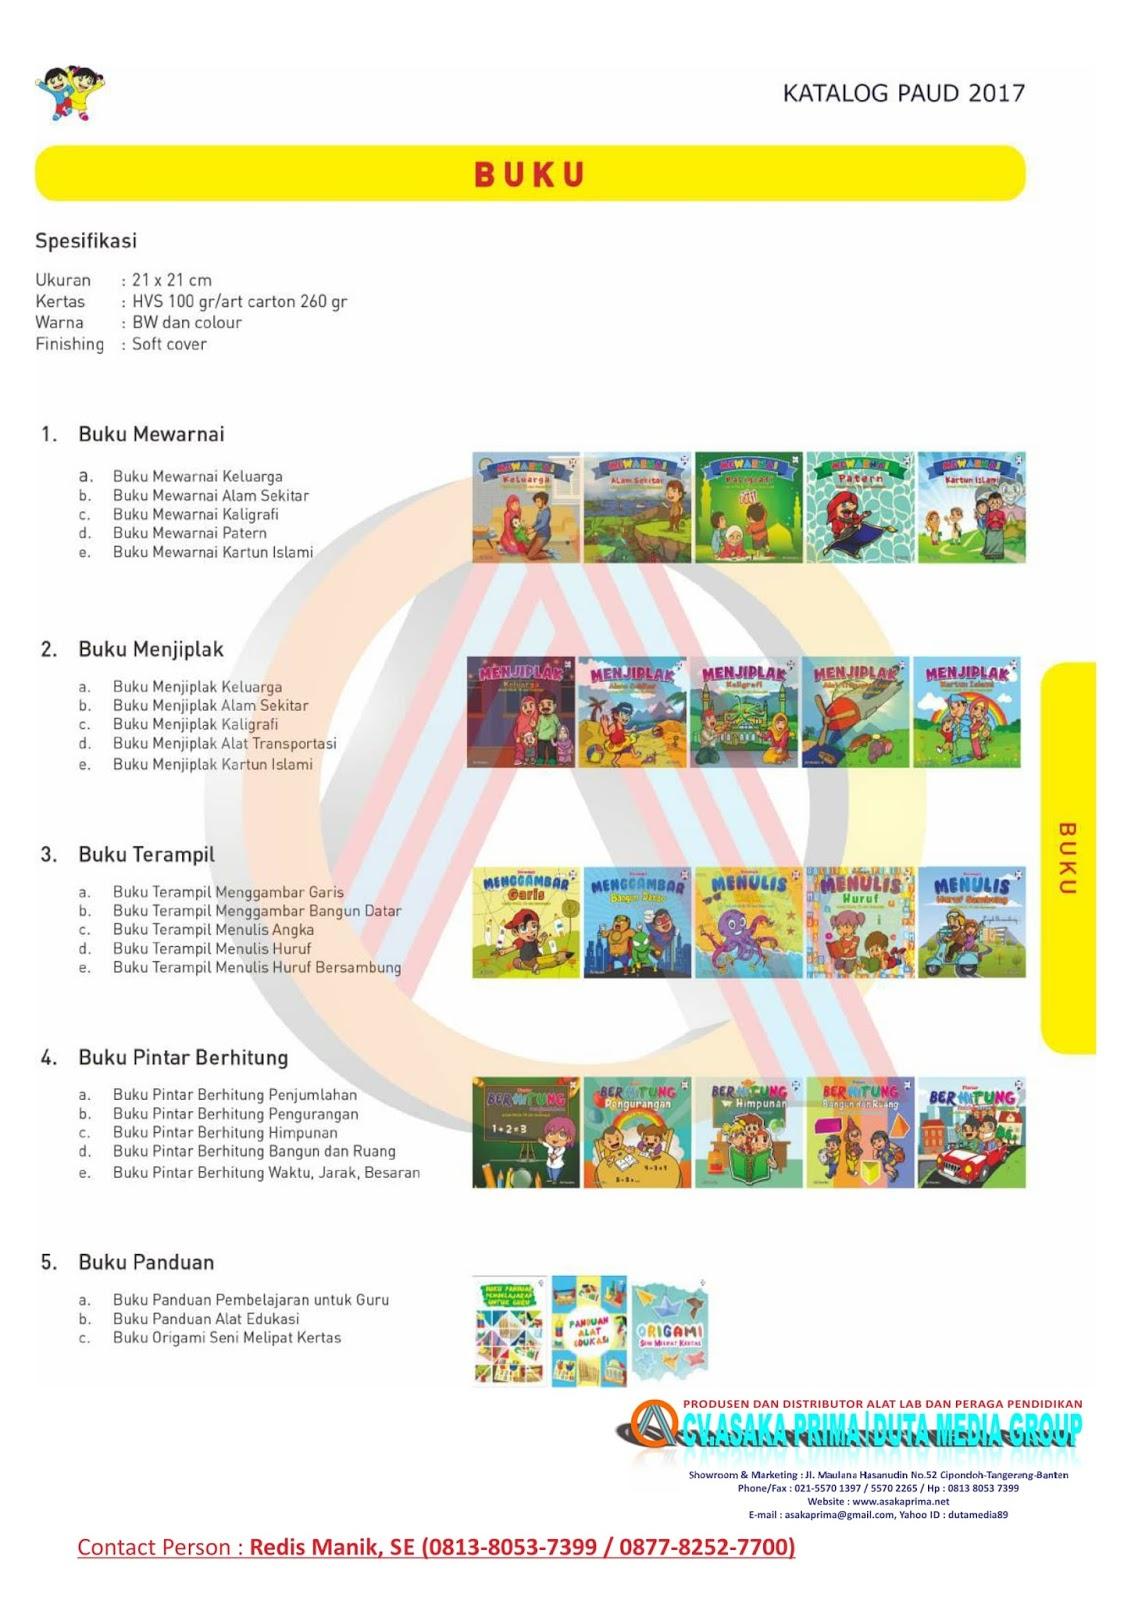 Spek Ape Dak Paud Tk Tahun 2017 Cvasaka Prima Juknis Bkkbn Buku Panduan Belajar Produksi Alat Peraga Tkalat Indoorape Outdoor